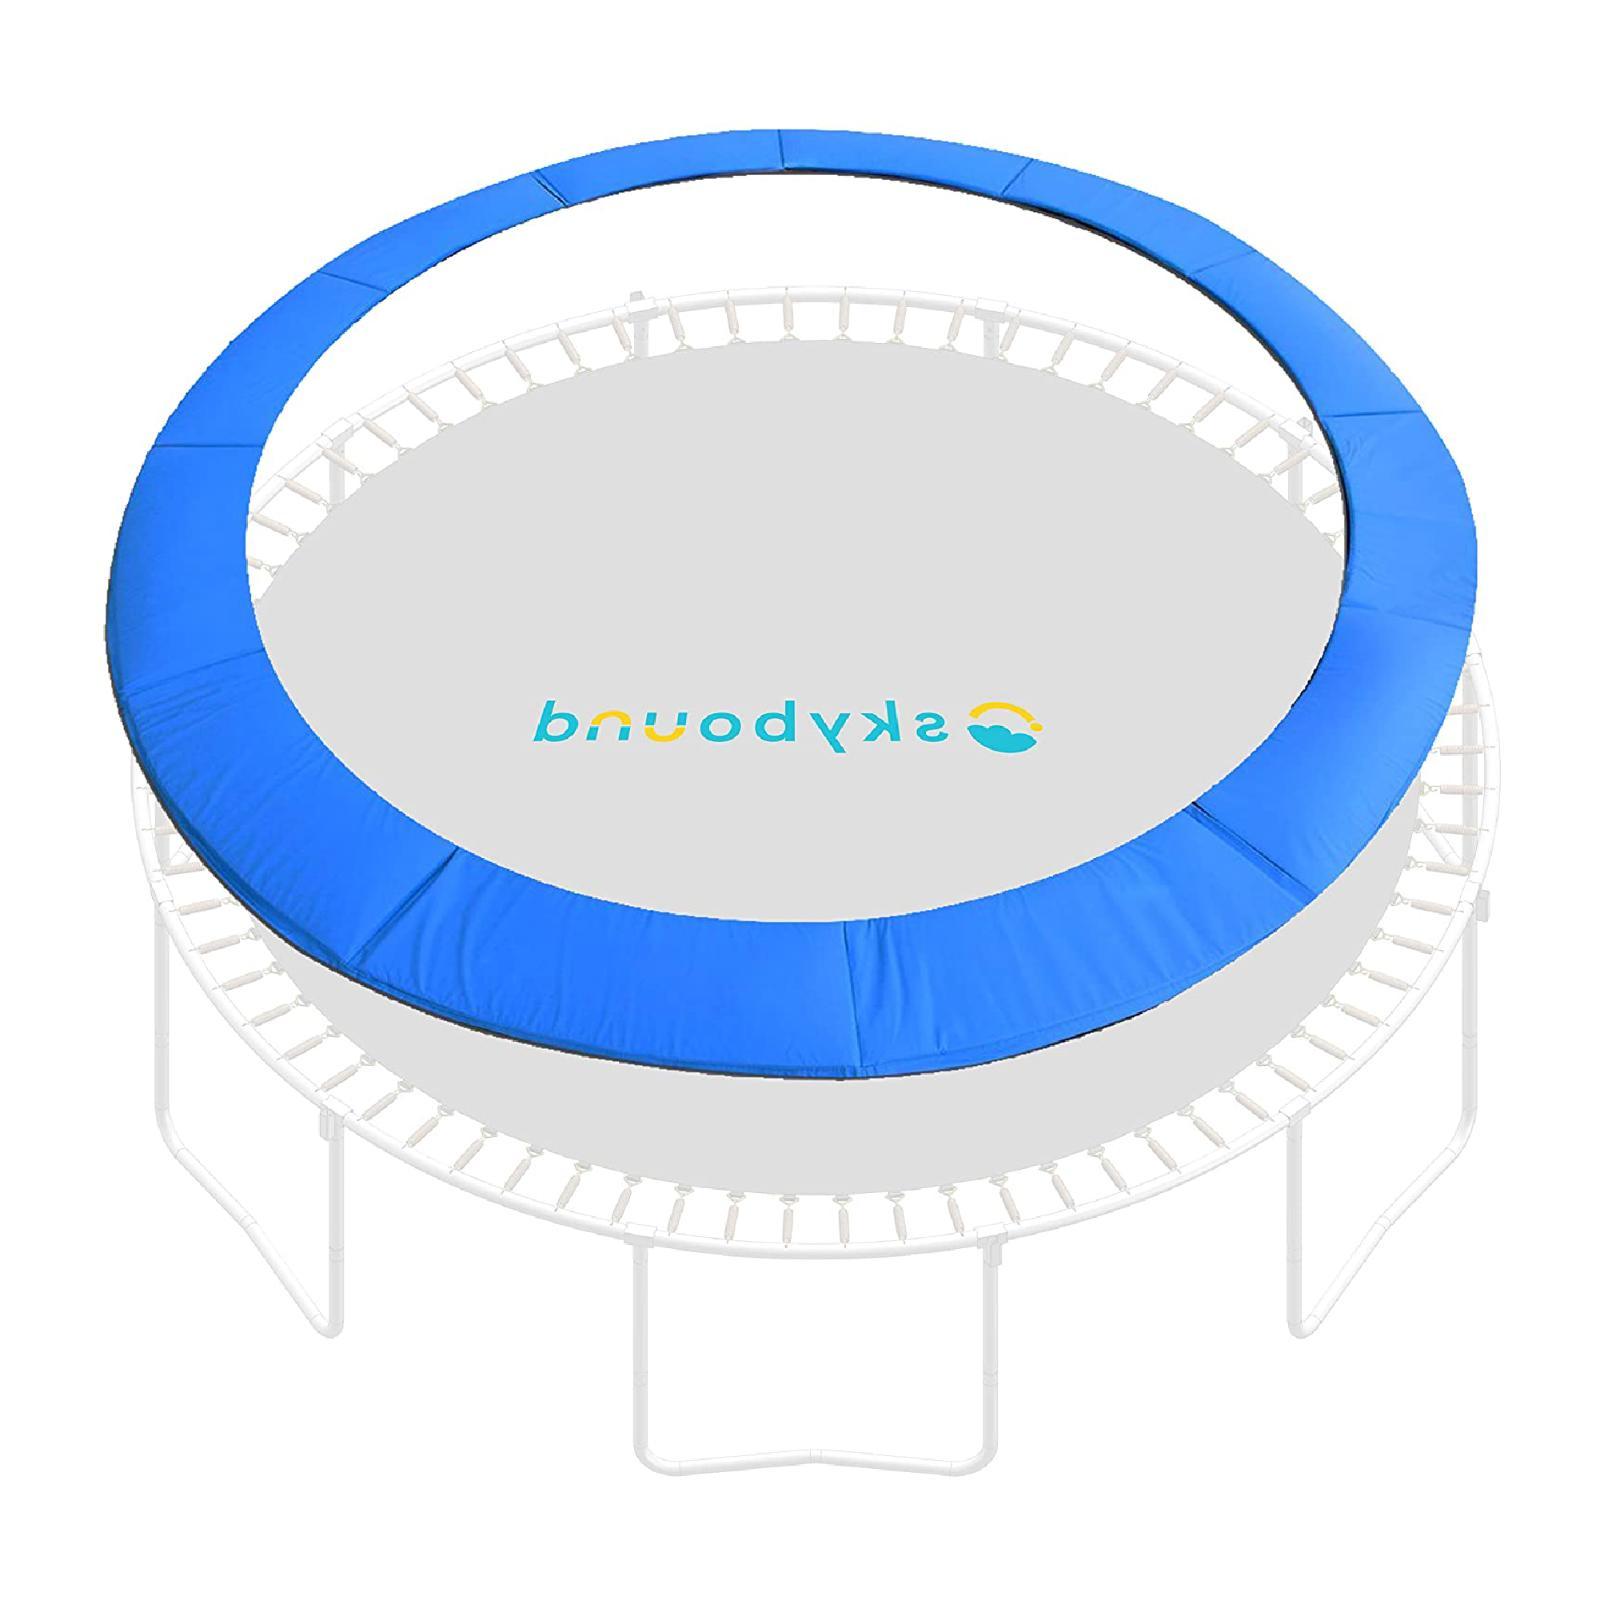 12 foot blue trampoline pad fits up